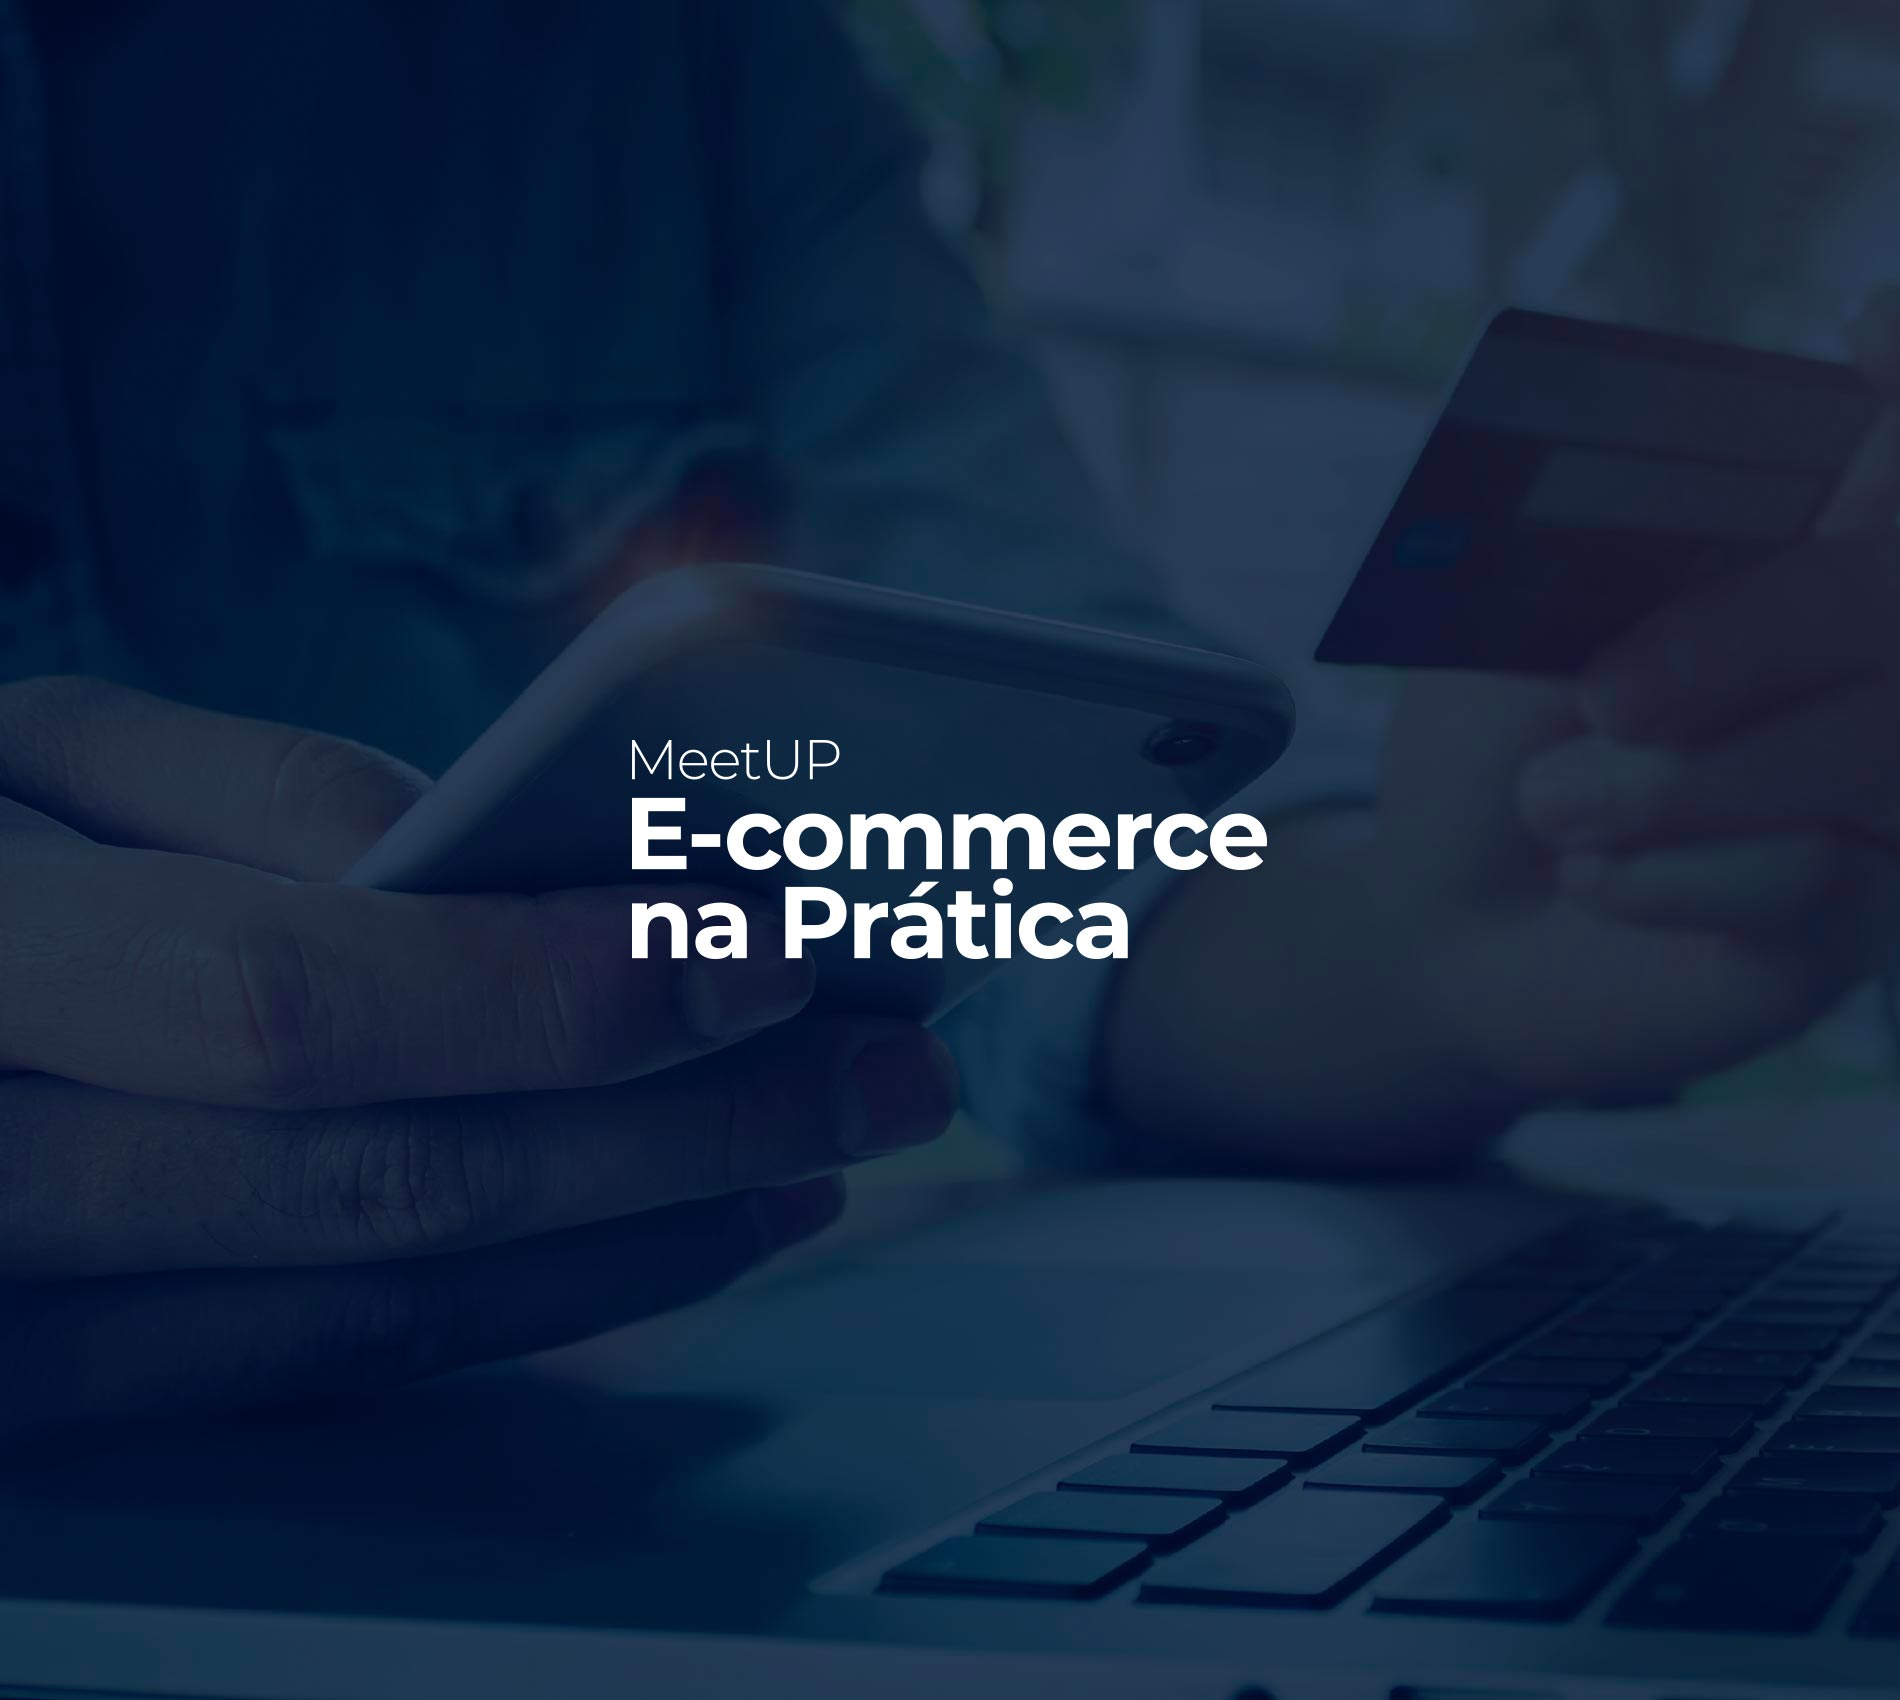 E-commerce na Prática 2019, Porto Alegre